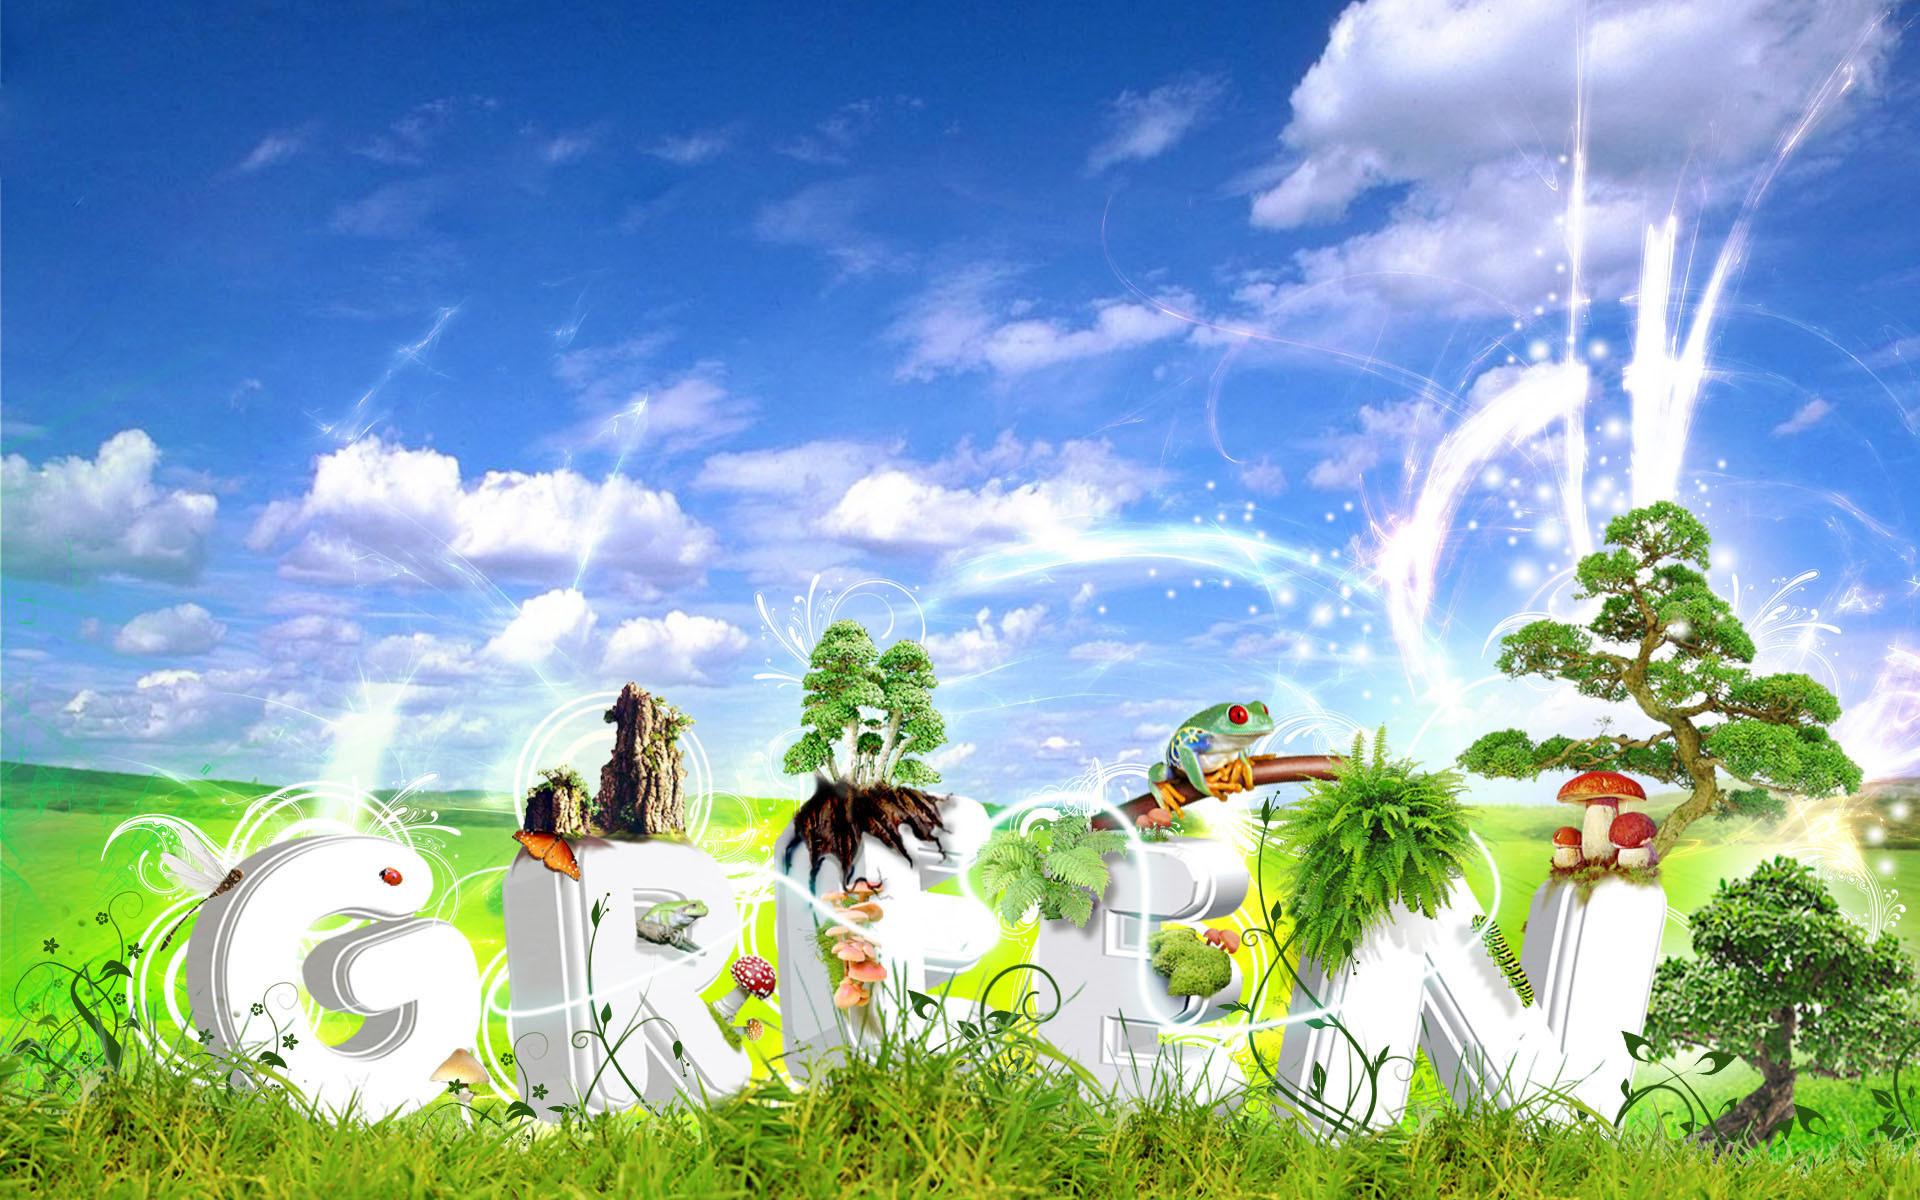 Res: 1920x1200, Creative Cartoon Spring High Definition Widescreen Lcd 460366 Wallpaper  wallpaper